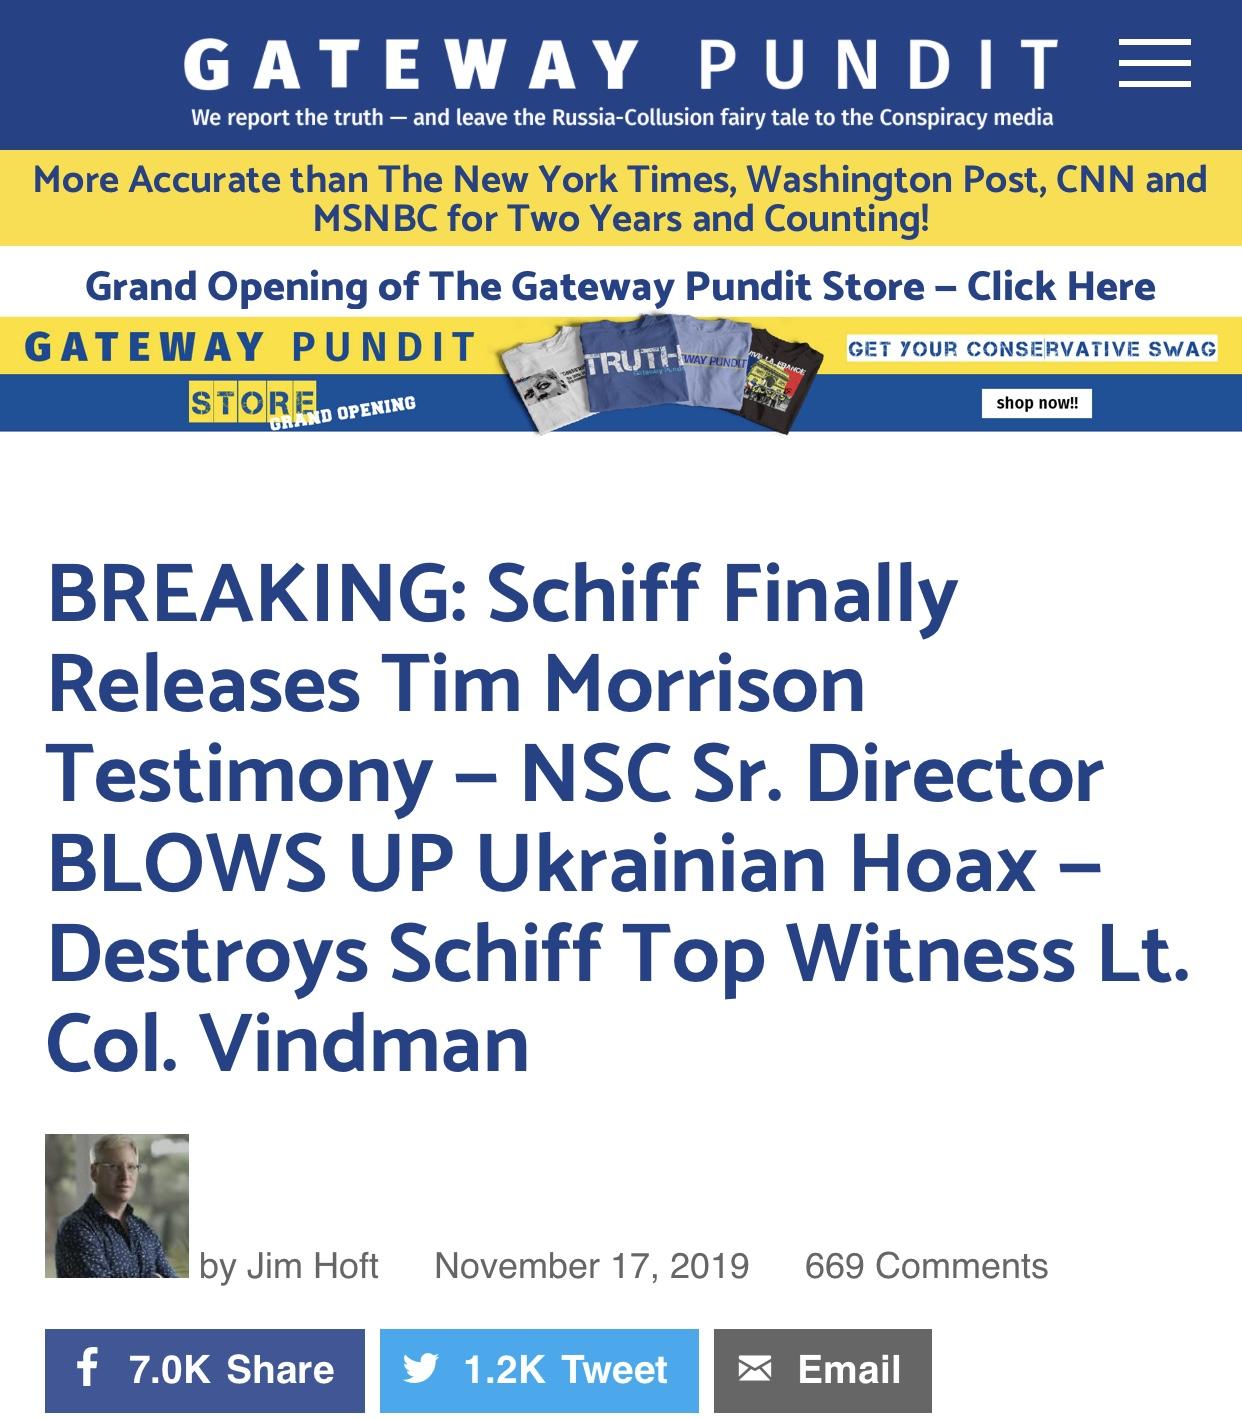 BREAKING: Schiff Releases Tim Morrison Testimony — NSC Sr. Director BLOWS UP Ukrainian Hoax — Destroys Schiff Top Witness Lt. Col. Vindman